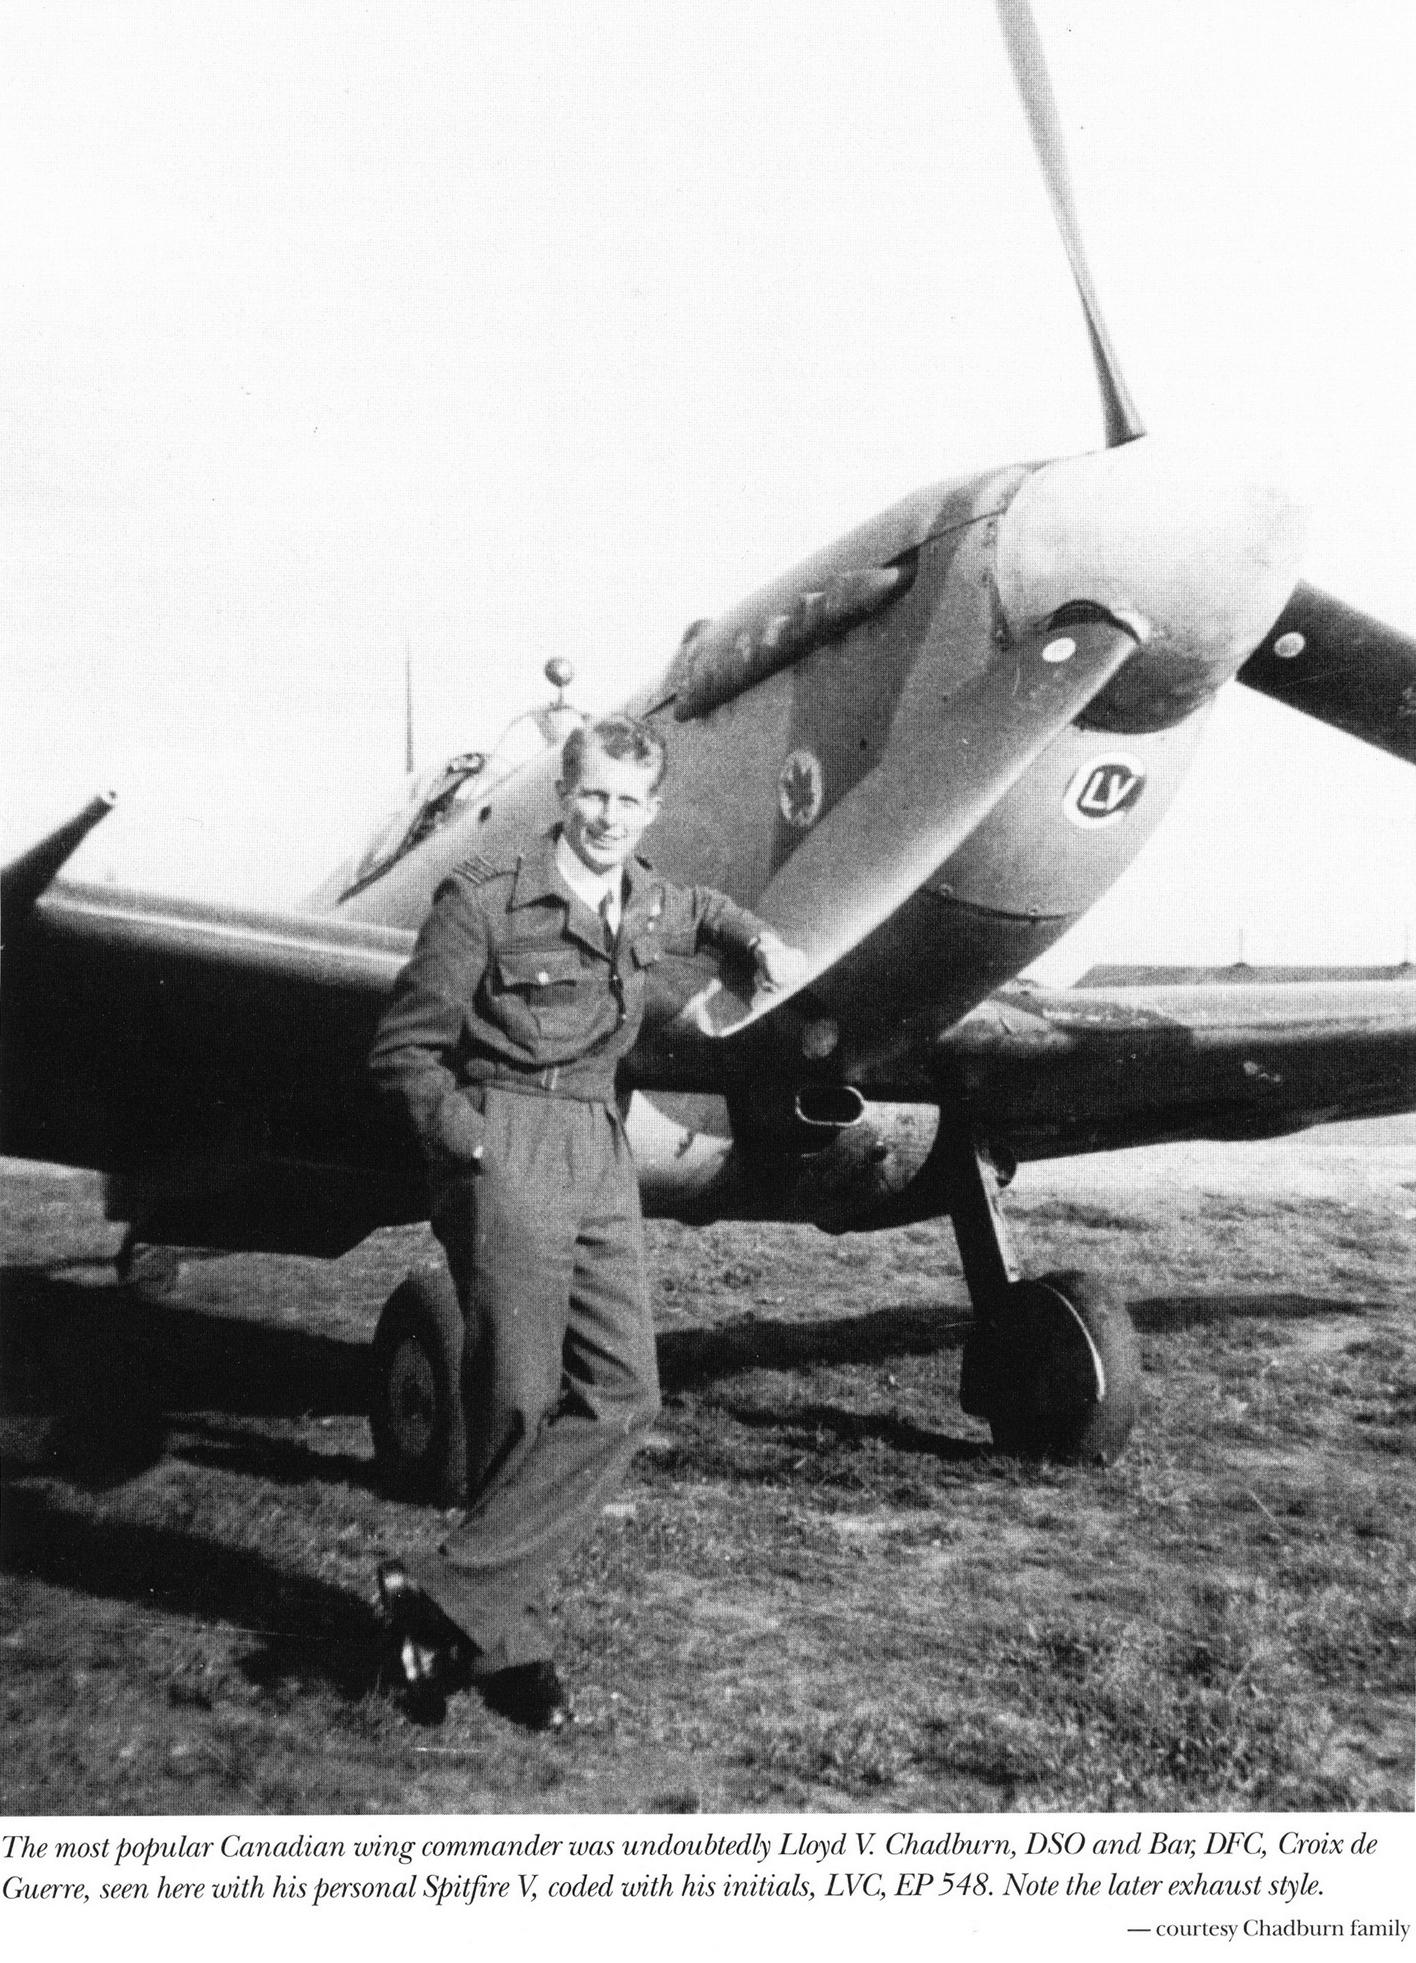 Spitfire MkVb RCAF 403Sqn LVC Lloyd V Chadburn EP548 01